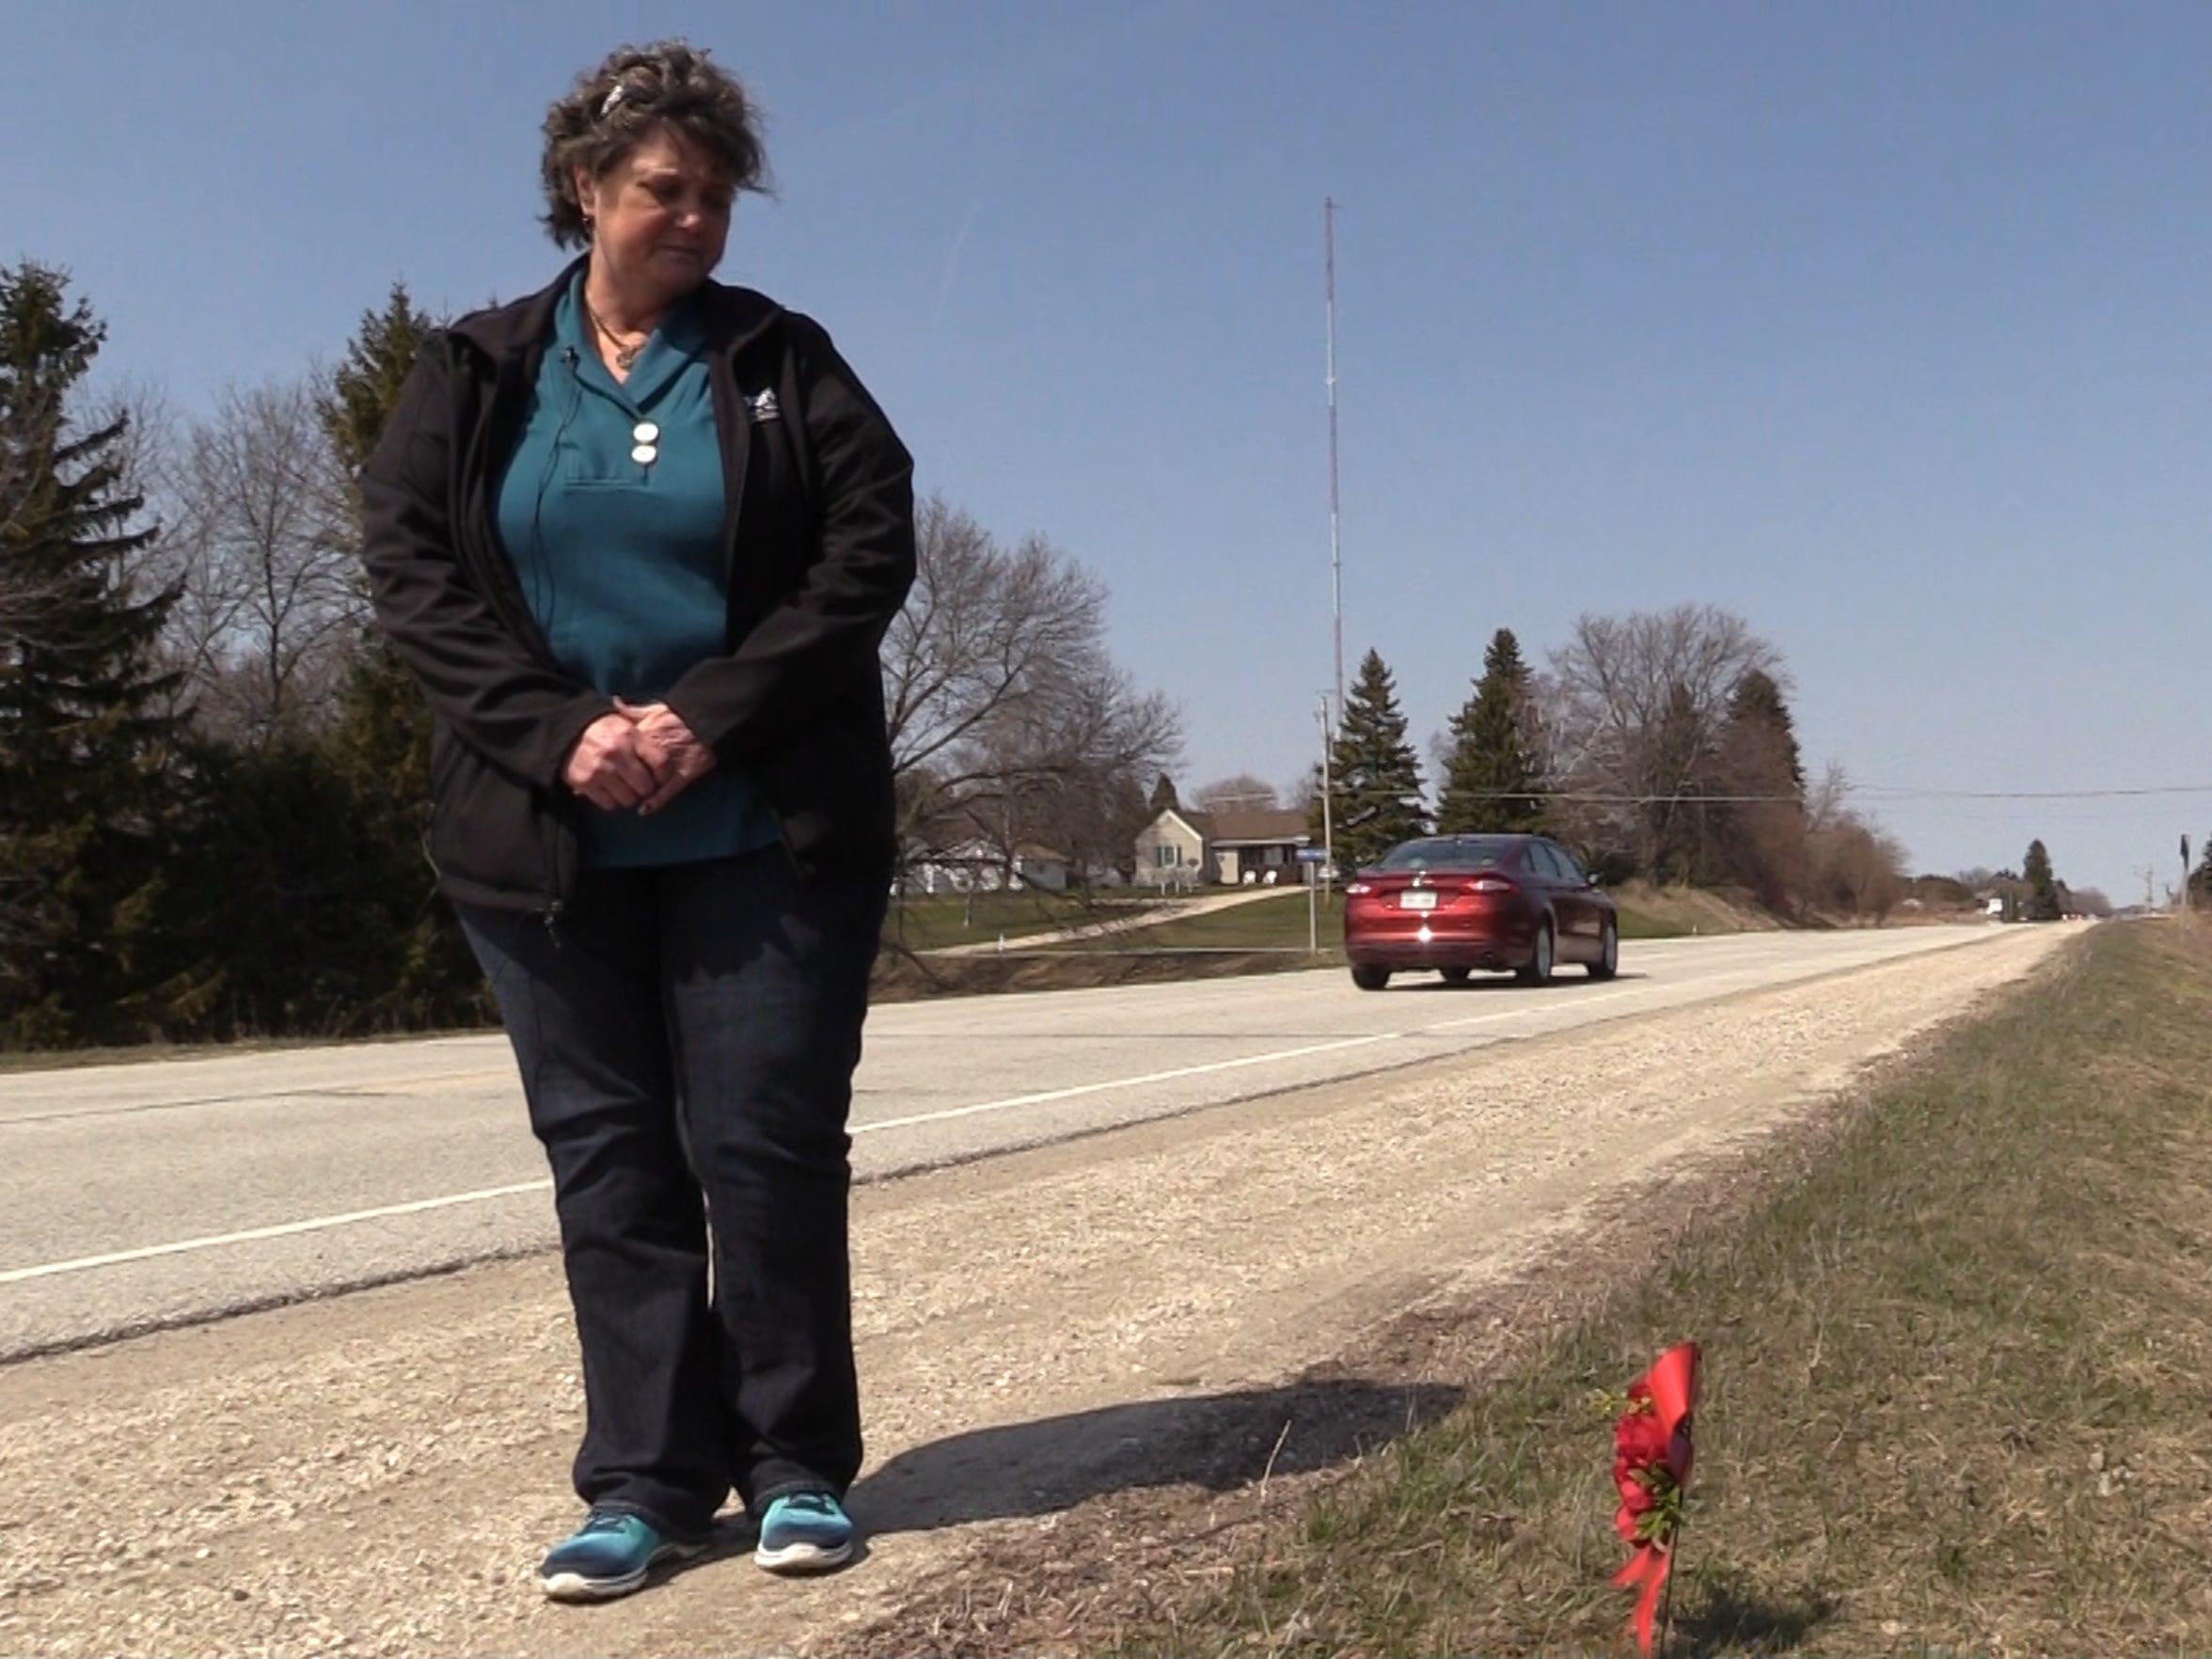 Debi Hochstetler looks over a new memorial wreath that